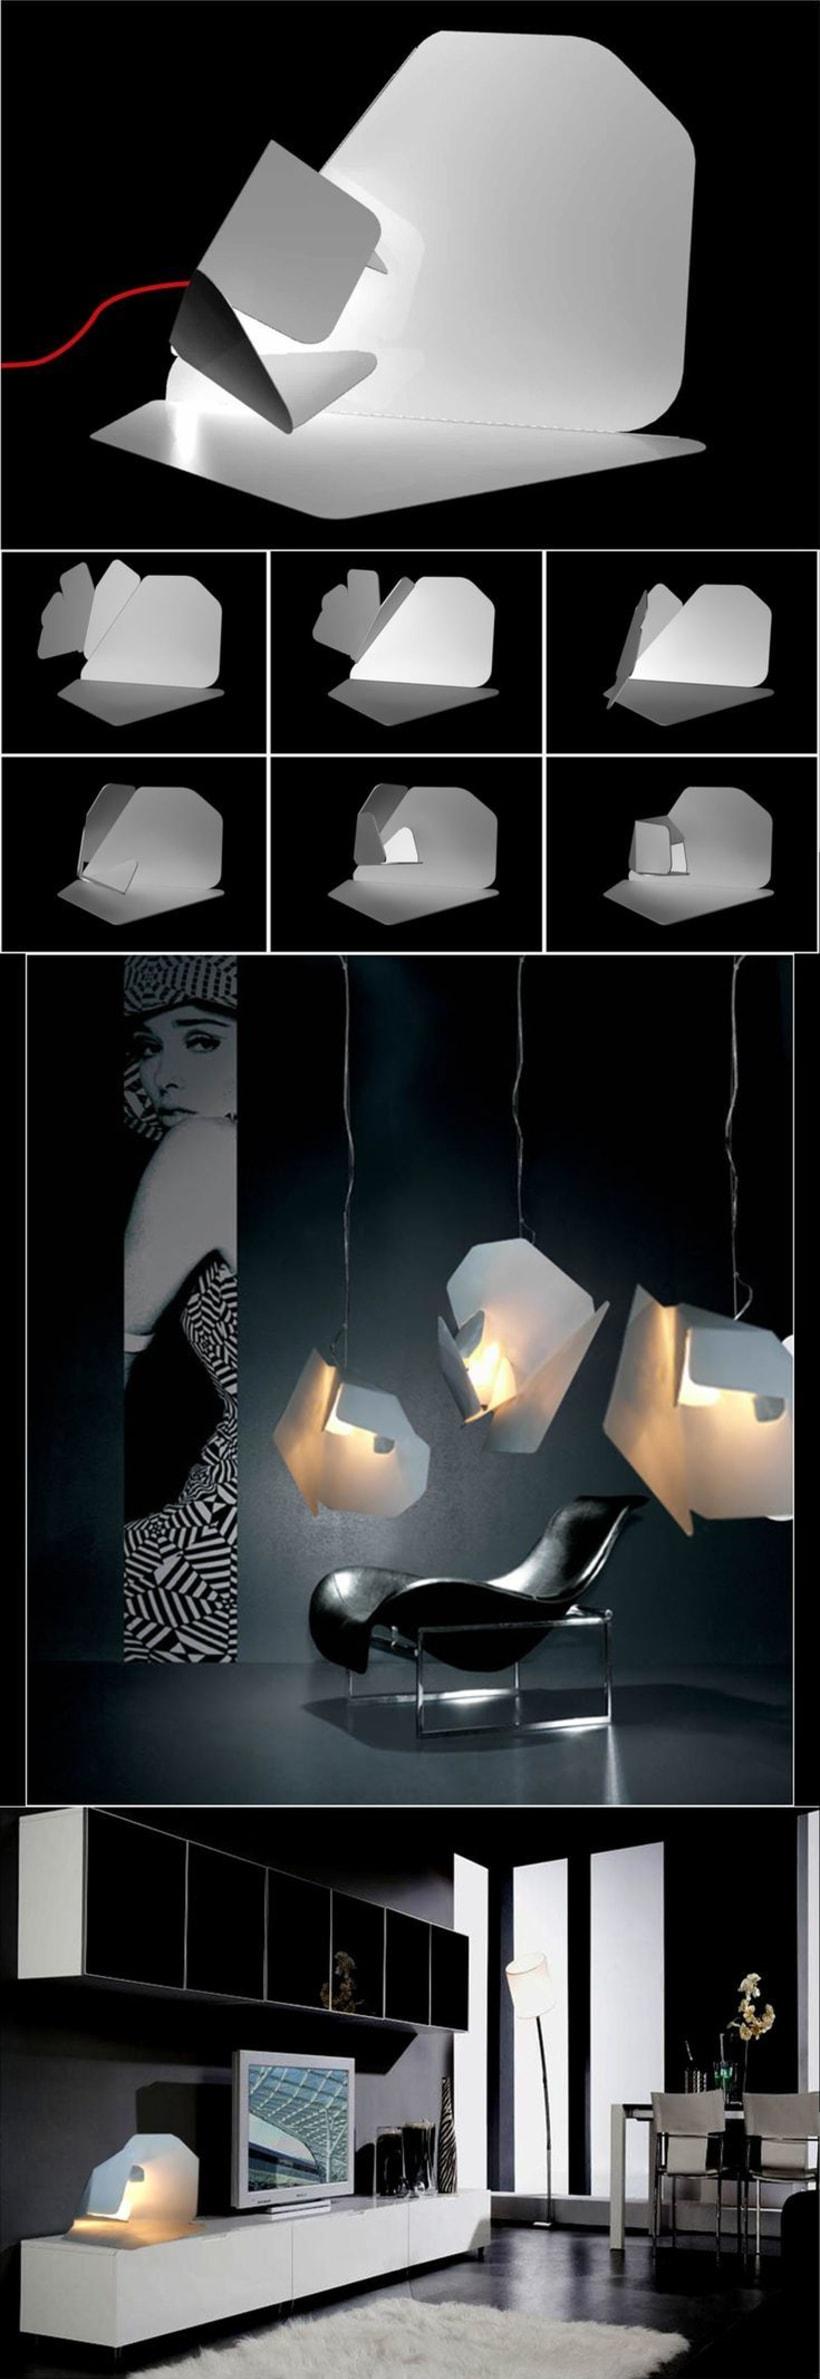 Plec - familia de lámparas 0